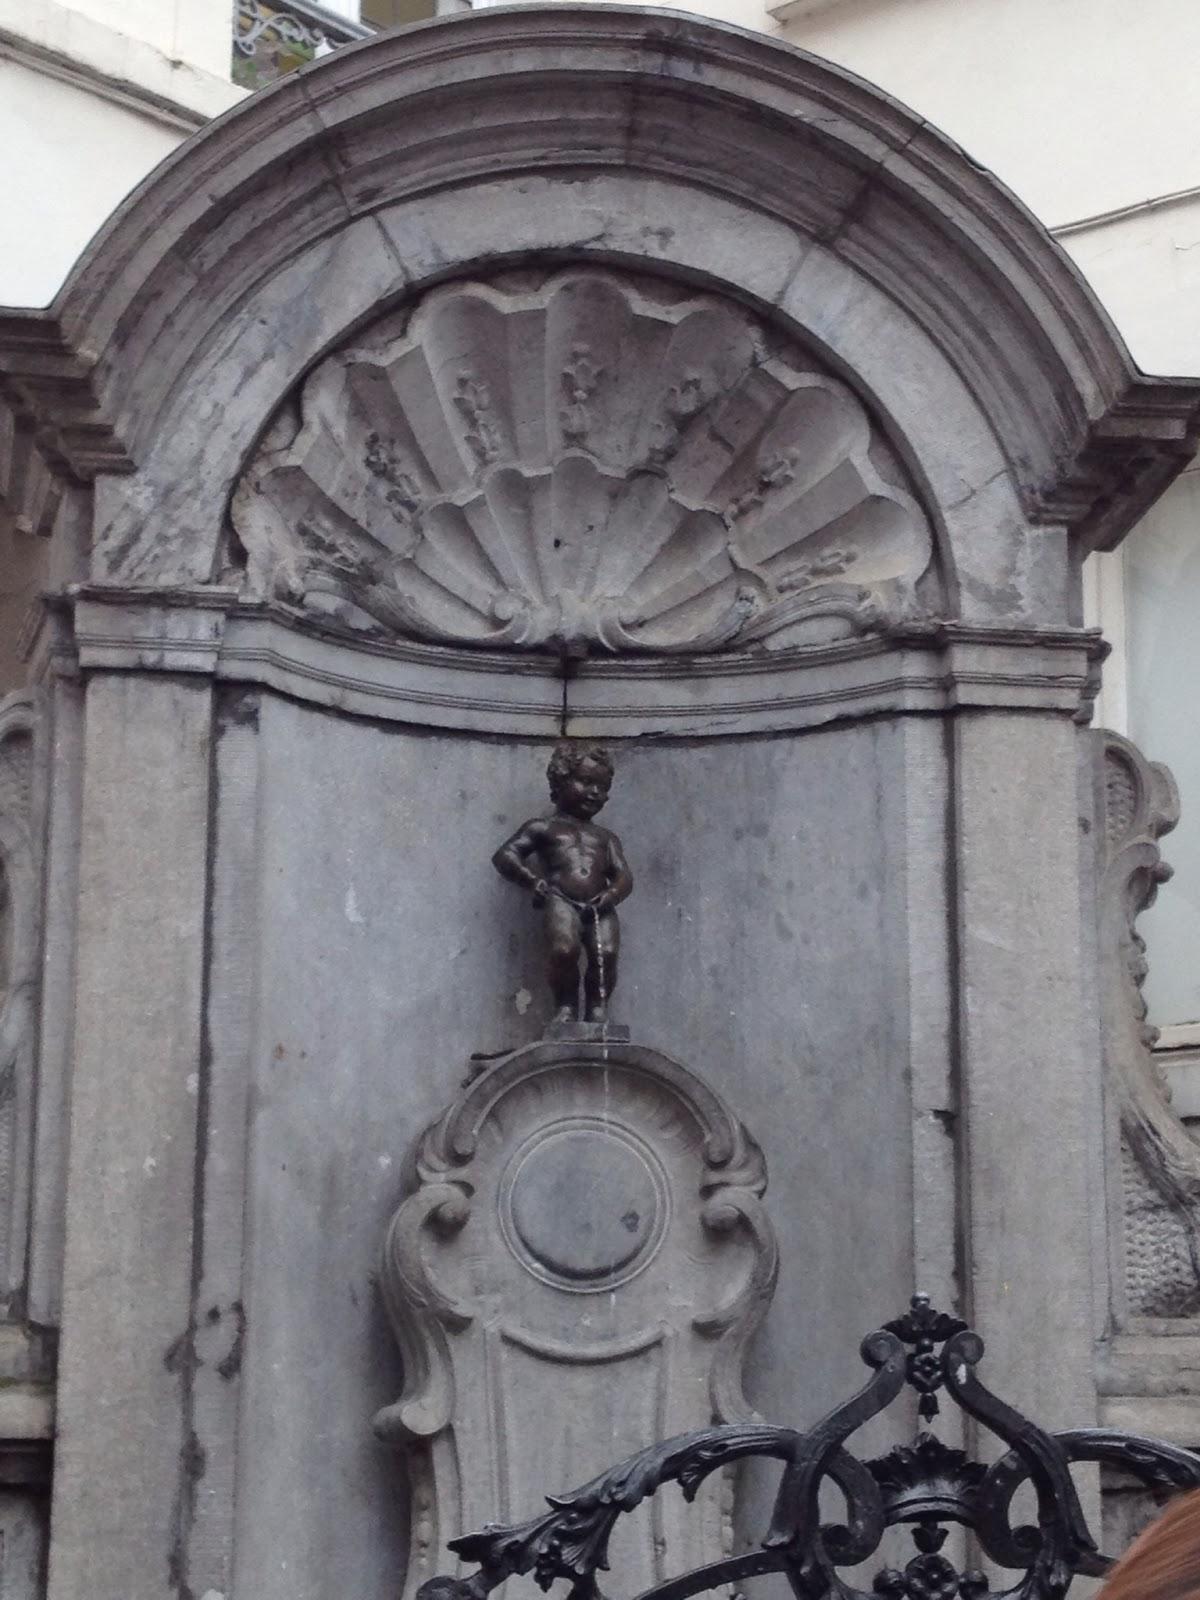 Brussels - Manneken Pis